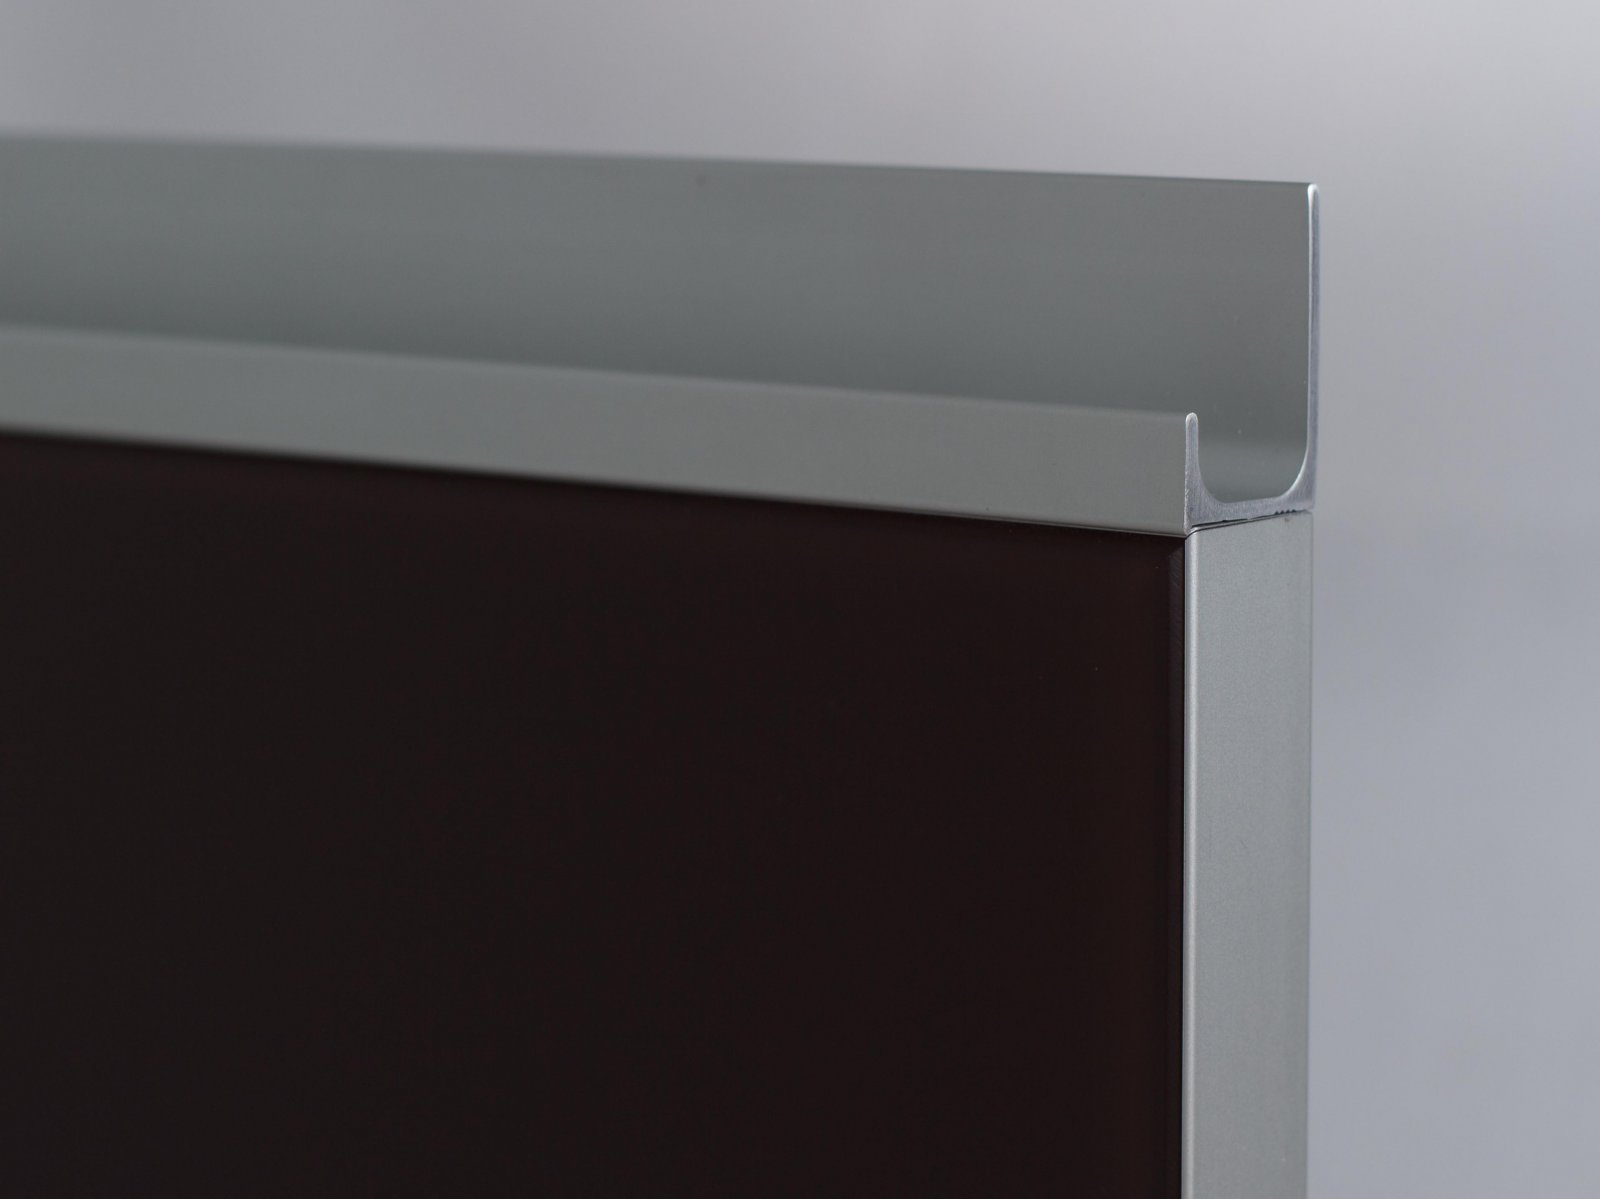 Porta-14 (Perfil V04 mate + puxador P01 mate + vidro lacado chocolate)